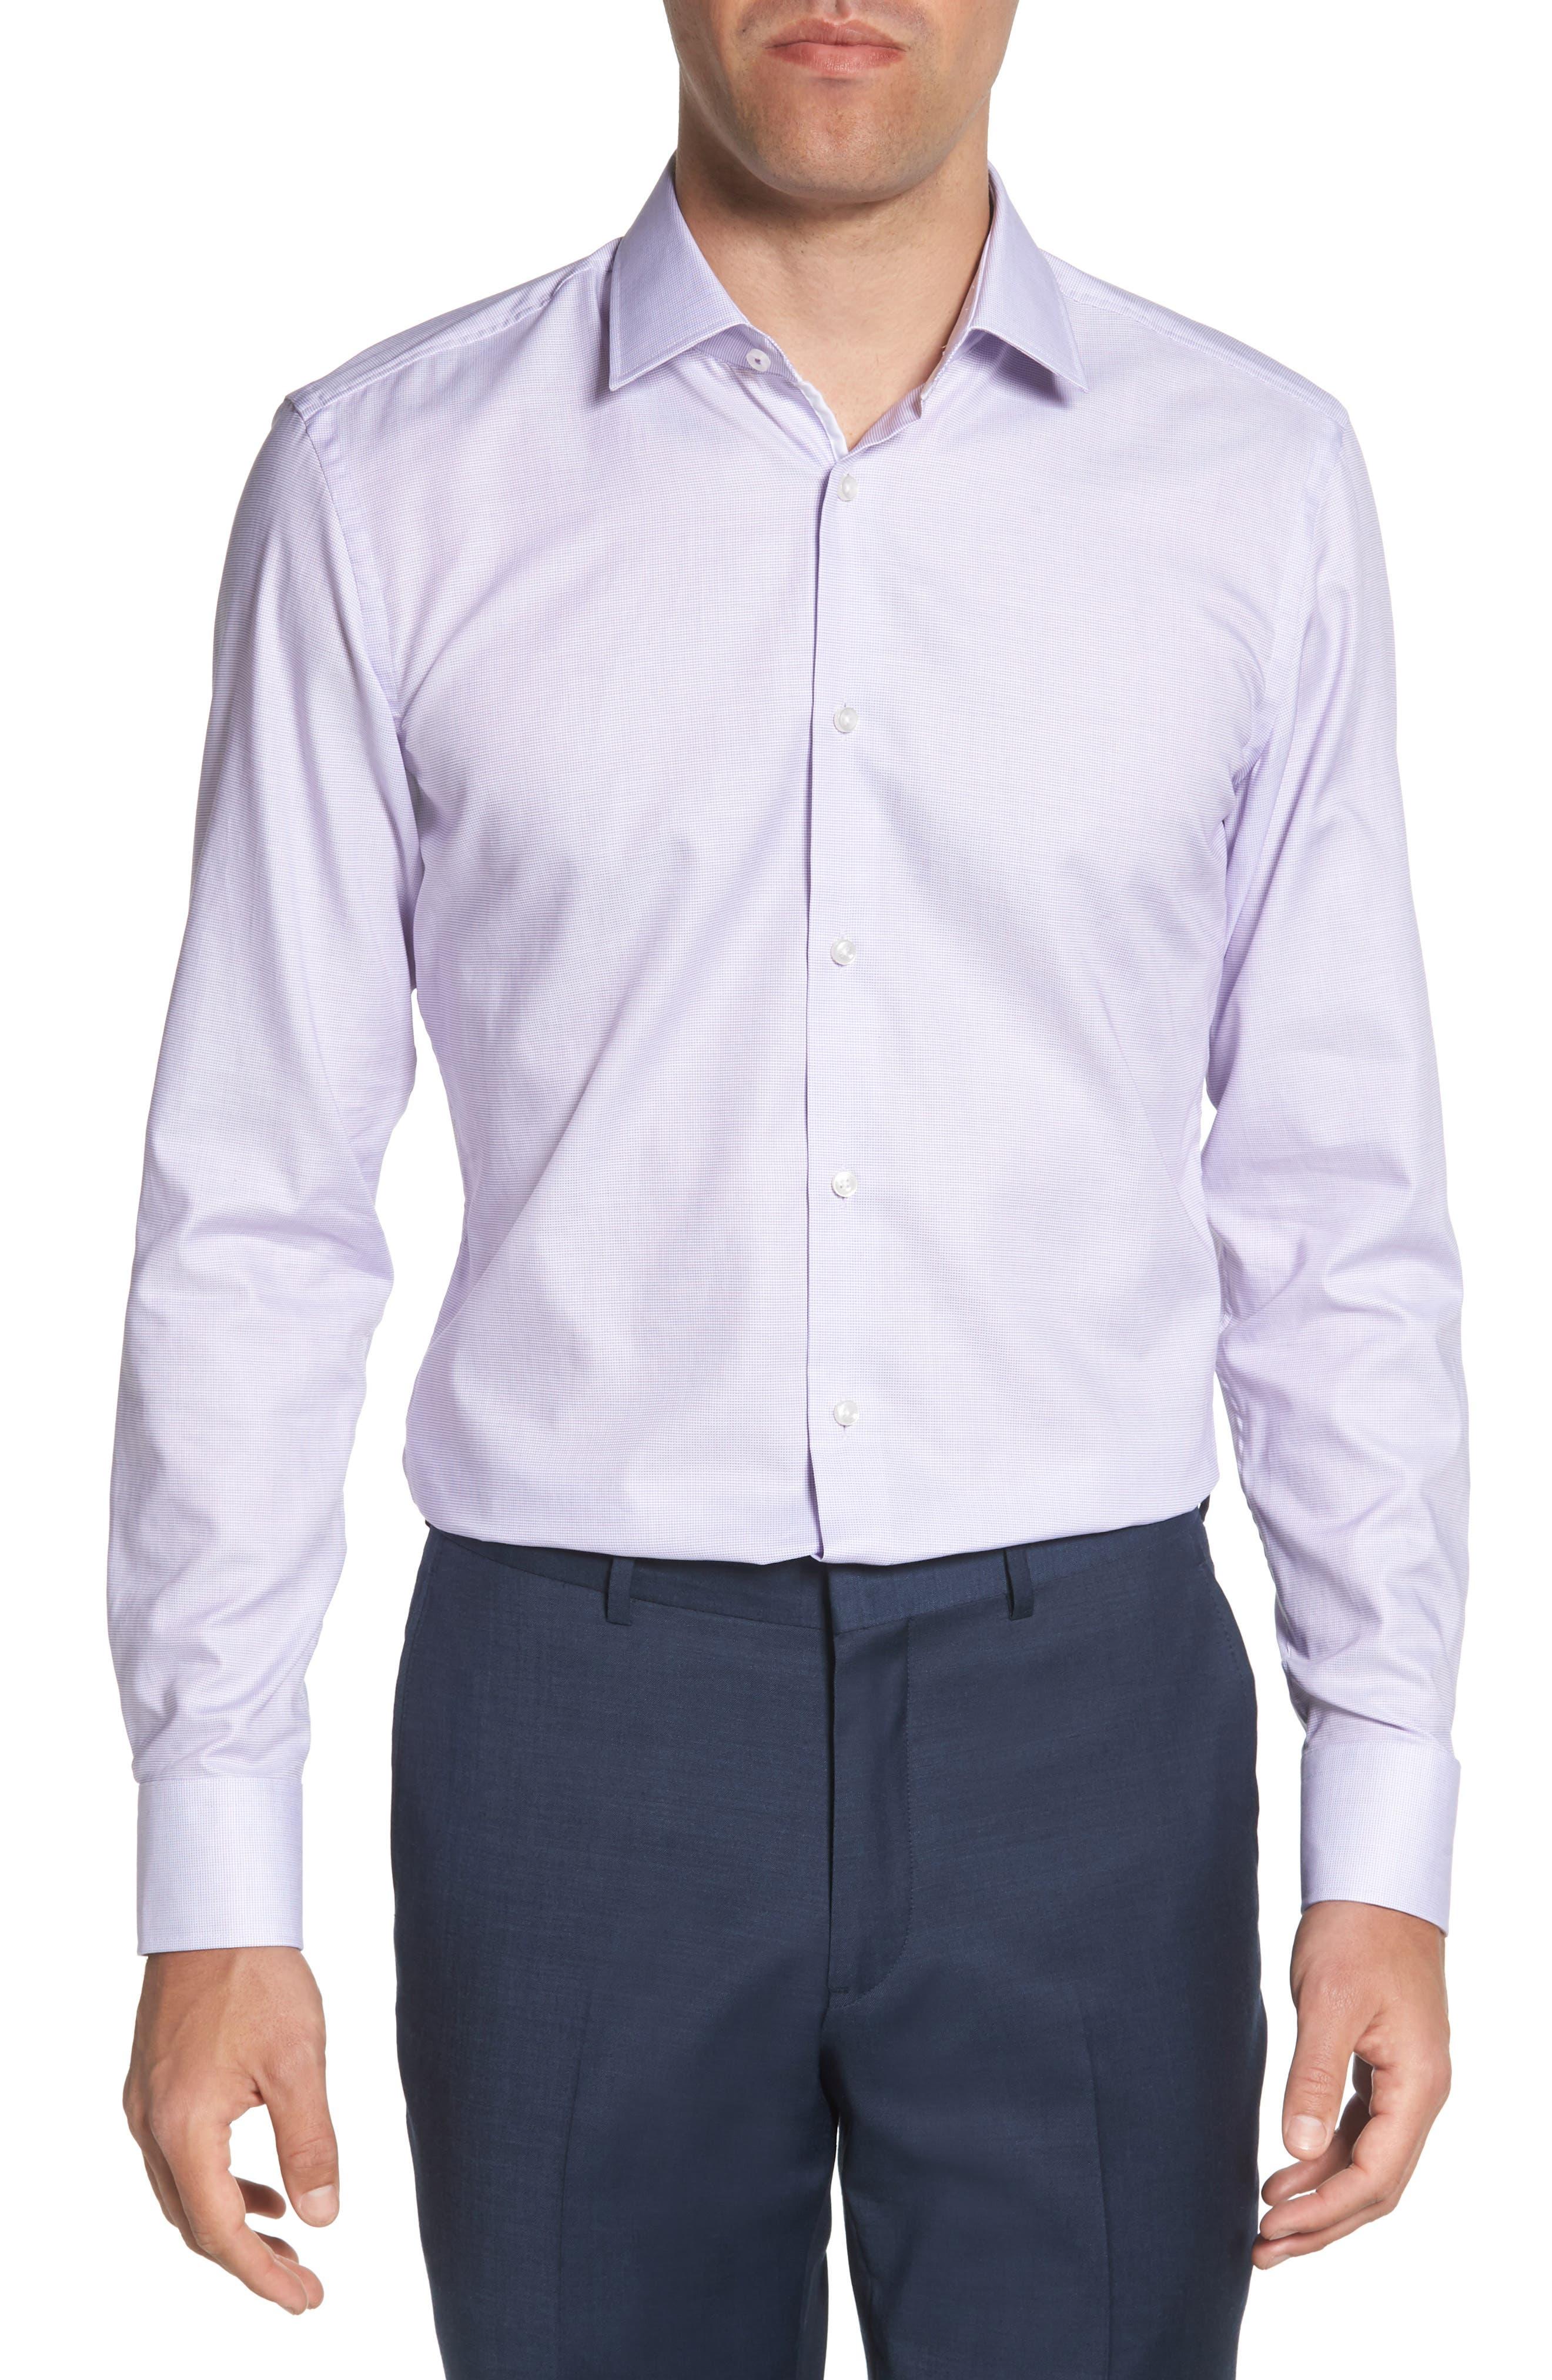 Jesse Slim Fit Dress Shirt,                         Main,                         color, 512